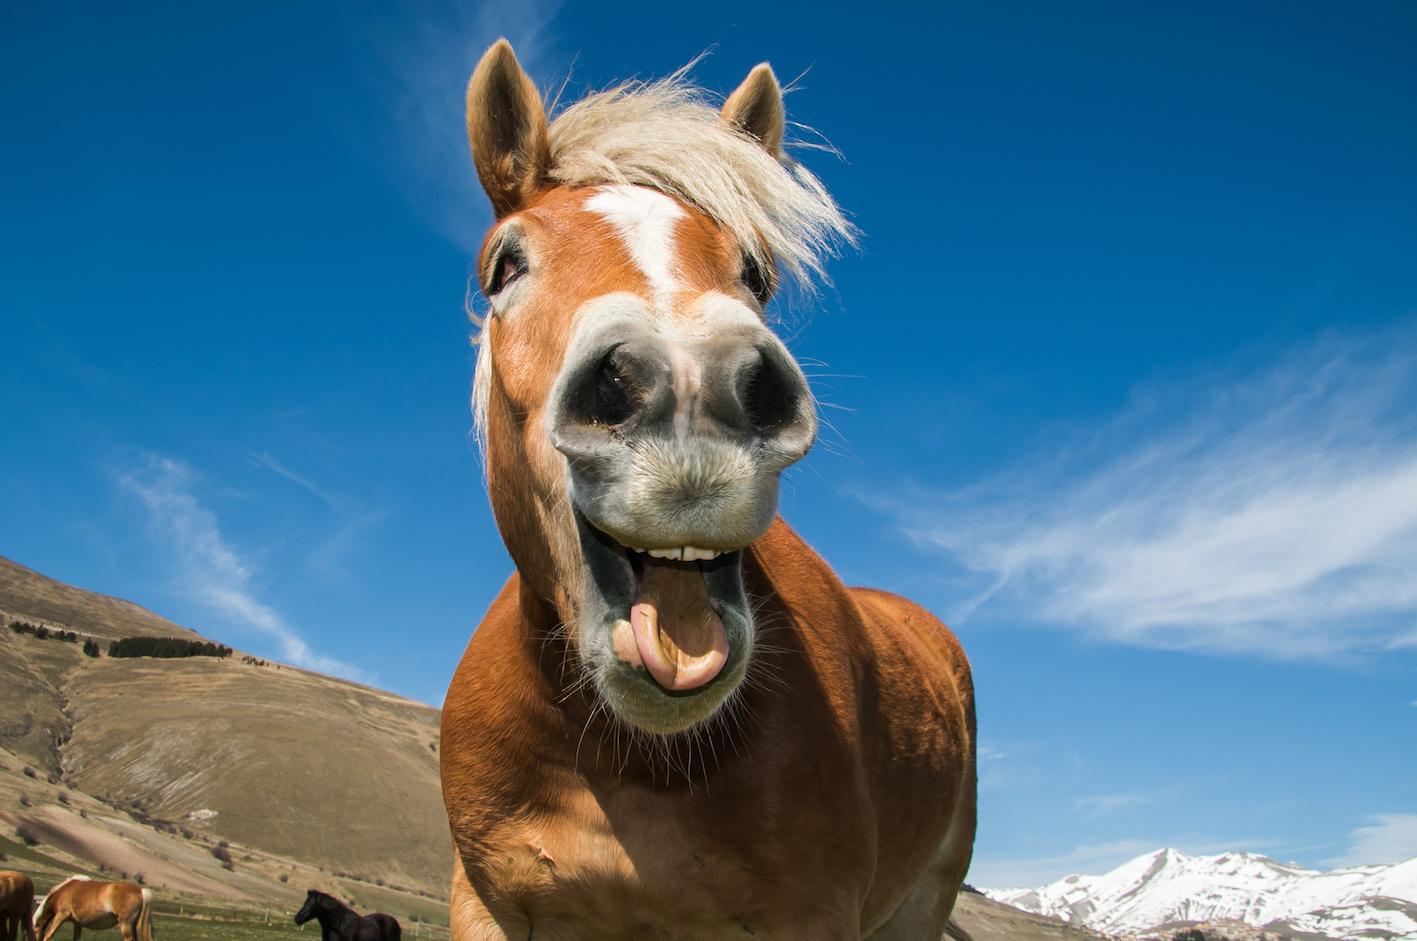 cavallo felice intramundi